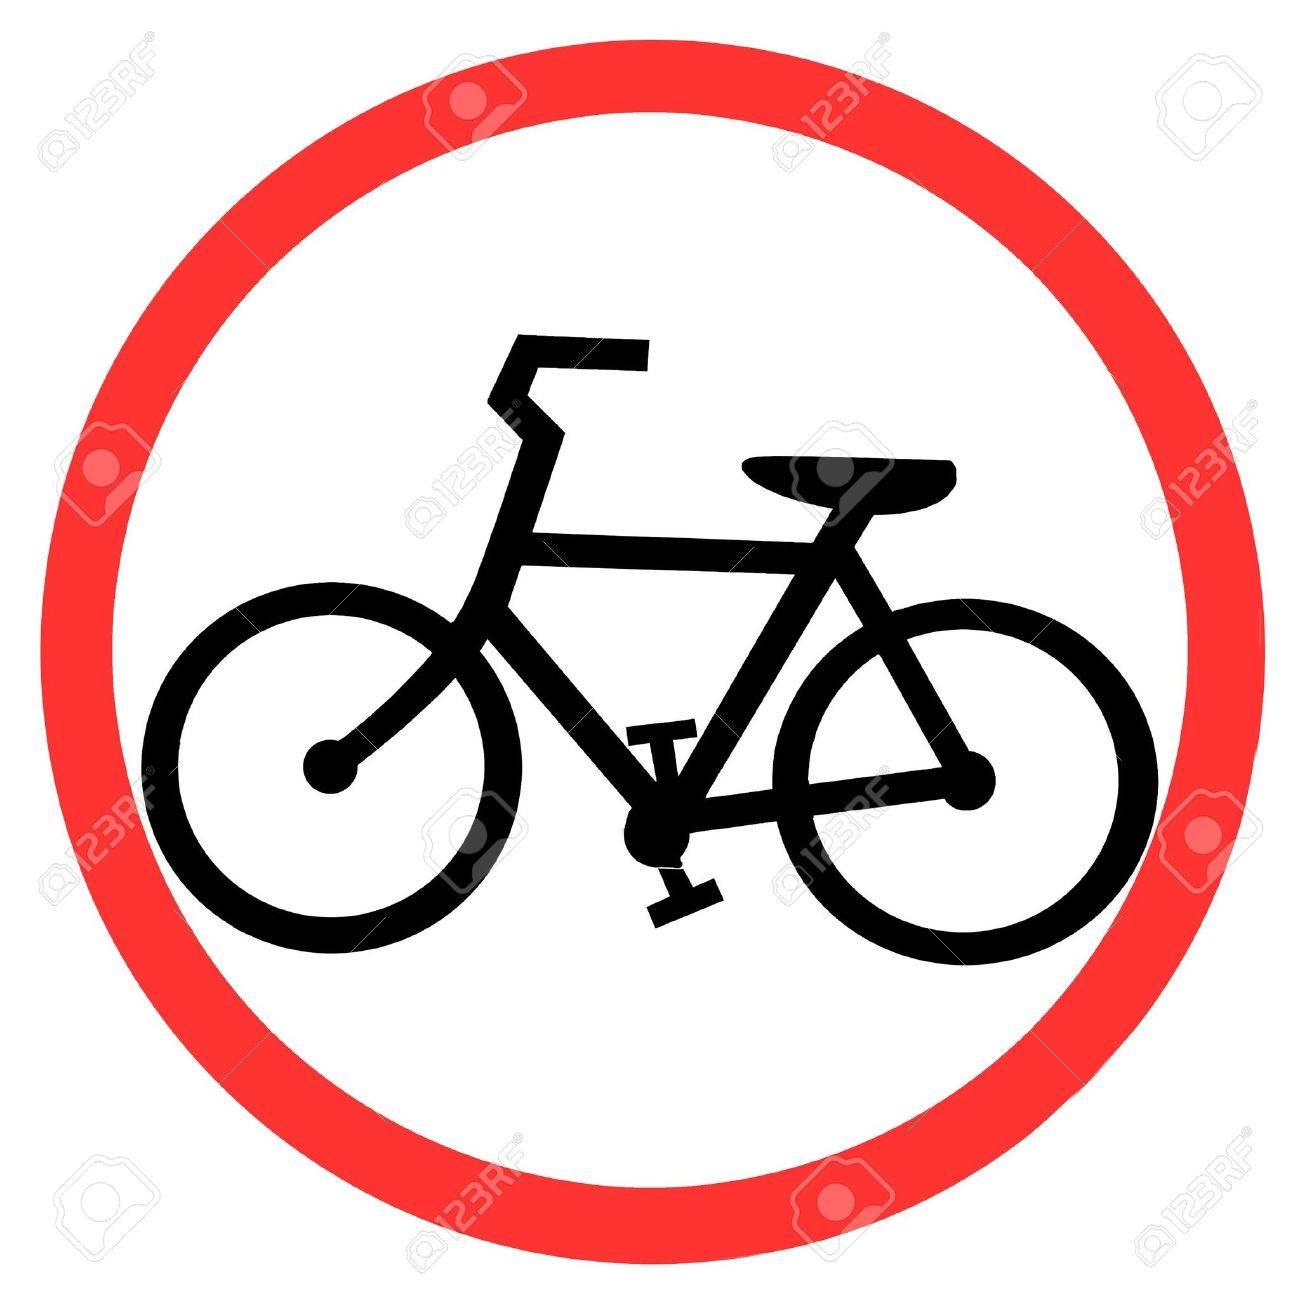 Symbol of Bicycle Lane Sign on White Background Stock Photo - 7601495